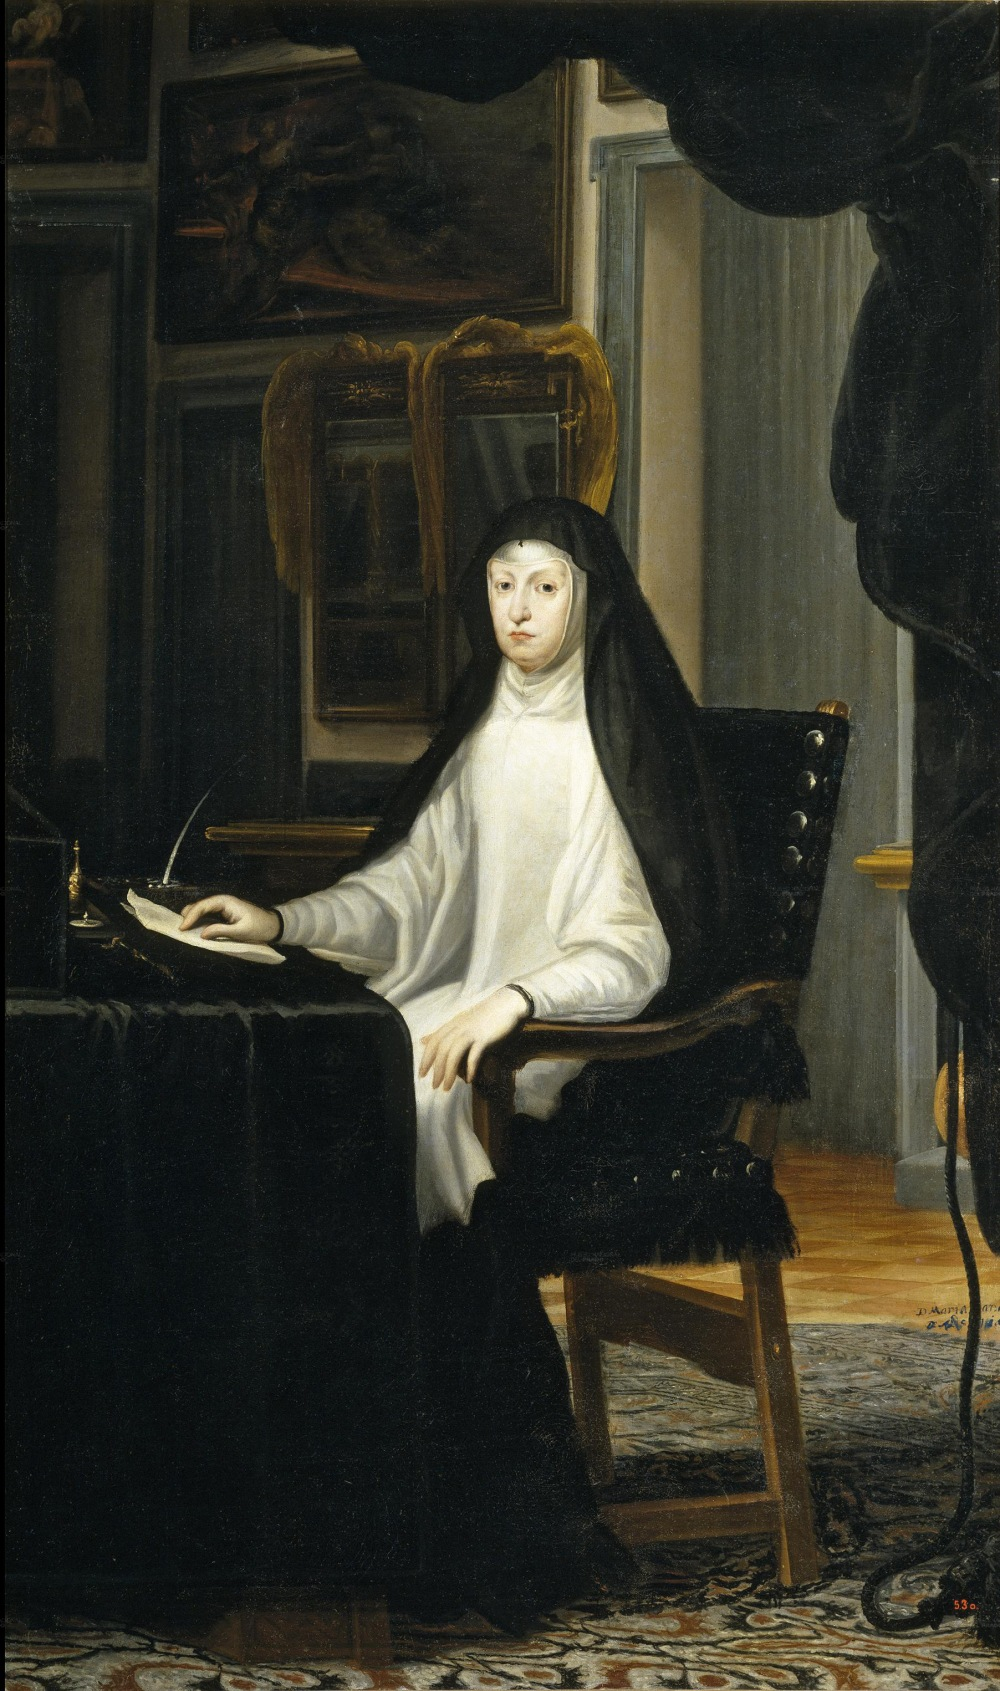 Juan Carreño de Miranda. Mariana de Austria. 1669. Museo del Prado. Madrid.